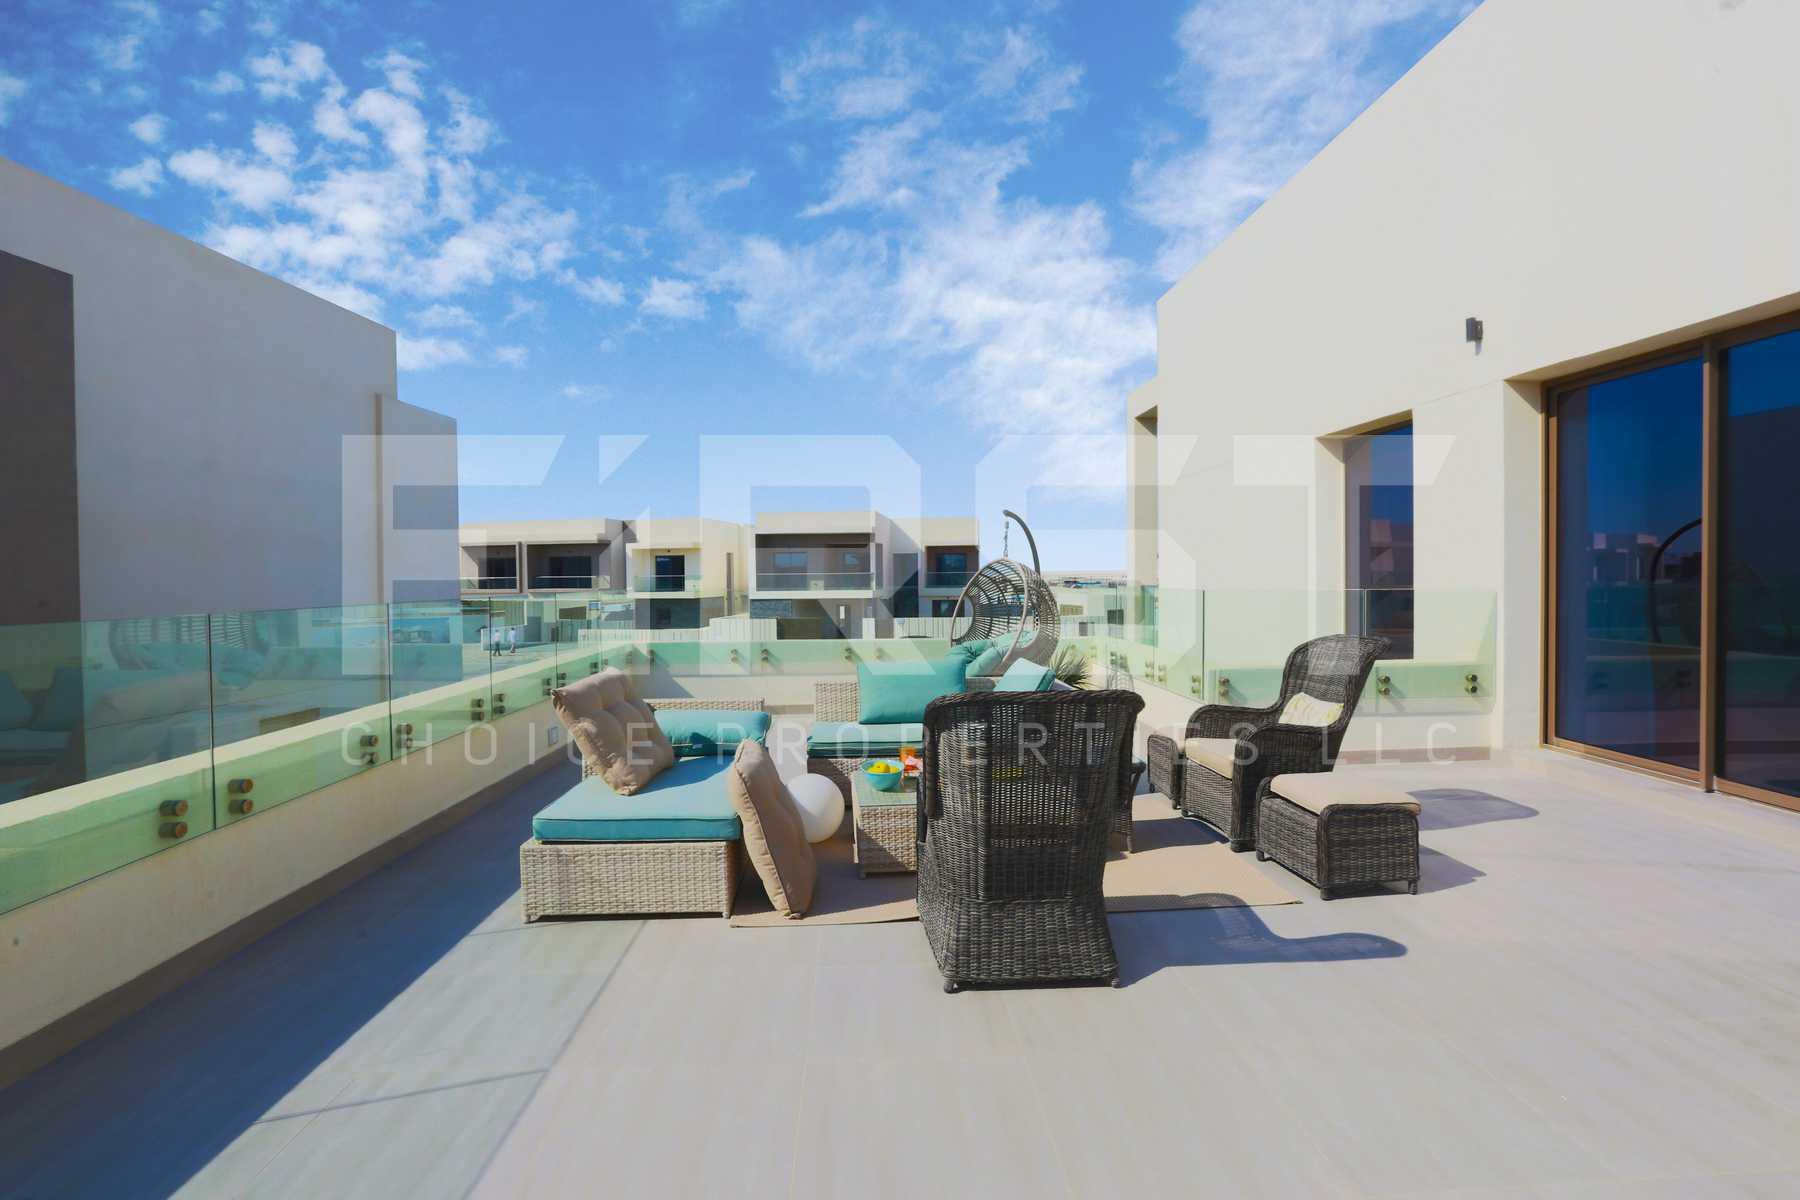 Internal Photo of 4 Bedroom Villa Type 4F in Yas Acres Yas Island Abu Dhabi UAE (2).jpg